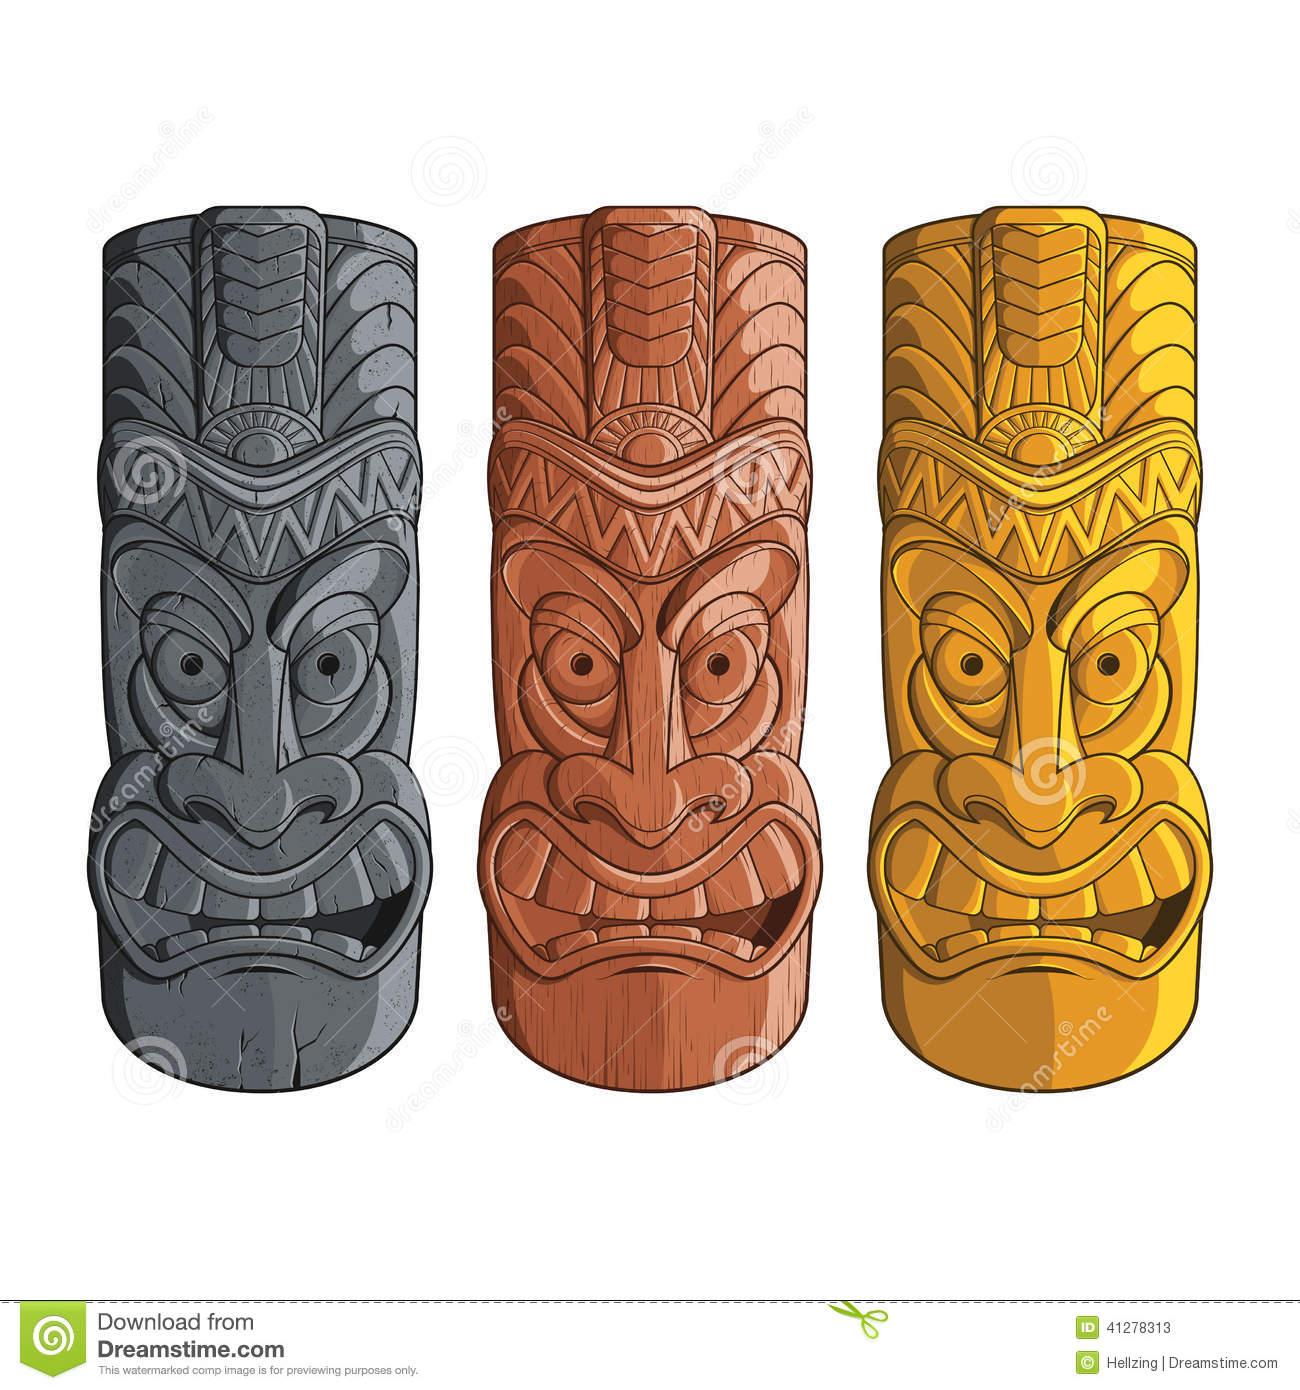 Tiki Idol Carved On Wood. Royalty Free Stock Photos.